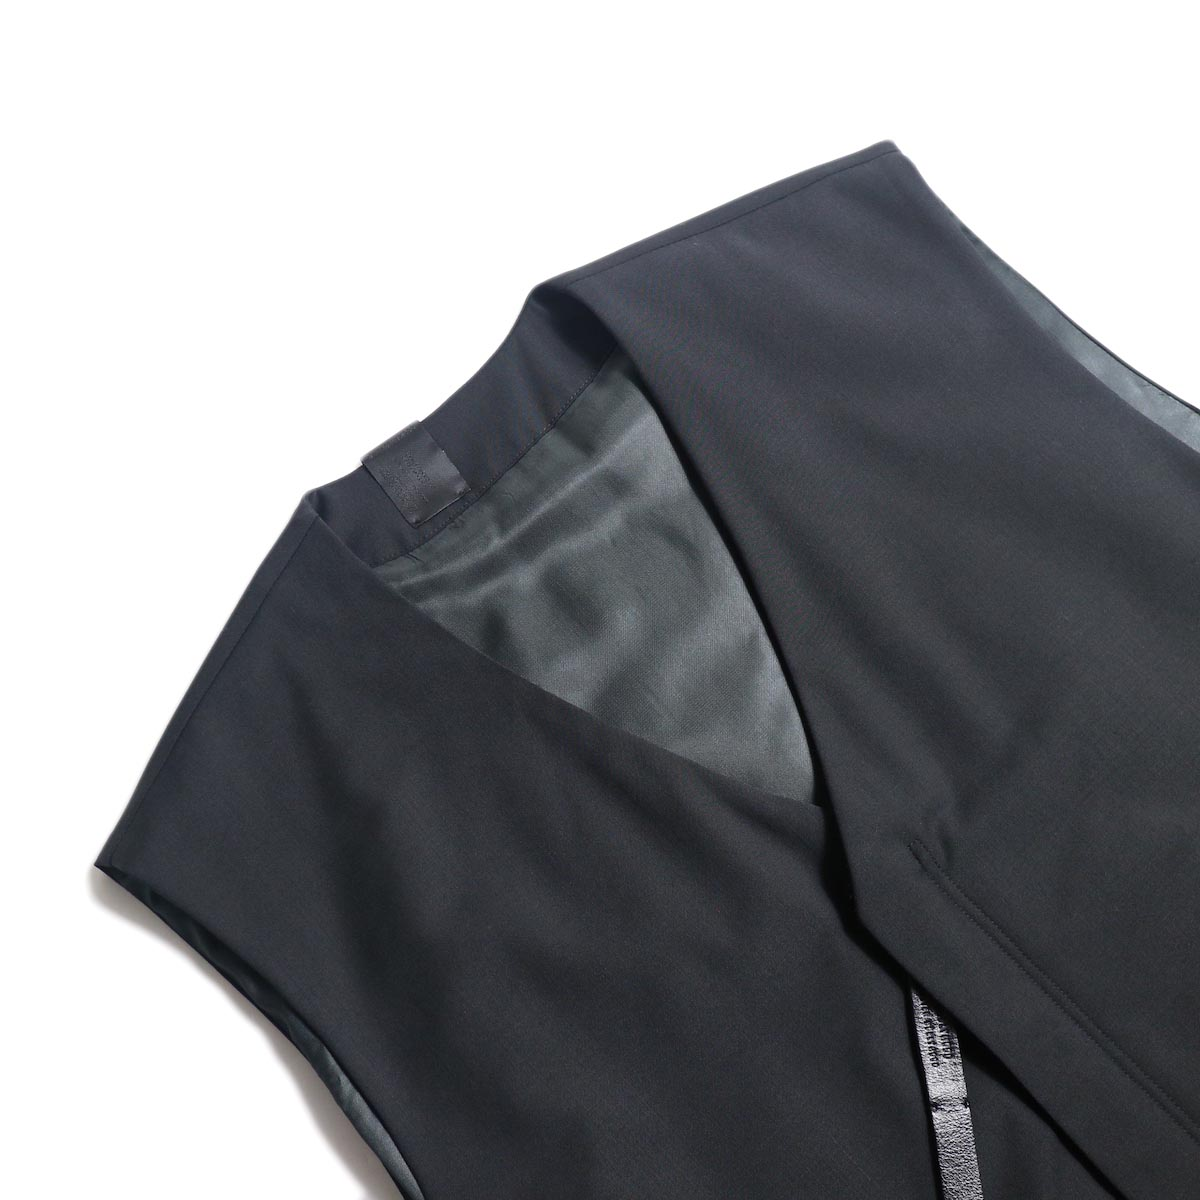 N.HOOLYWOOD / 2202-VE03-002 Vest (Black) ネック